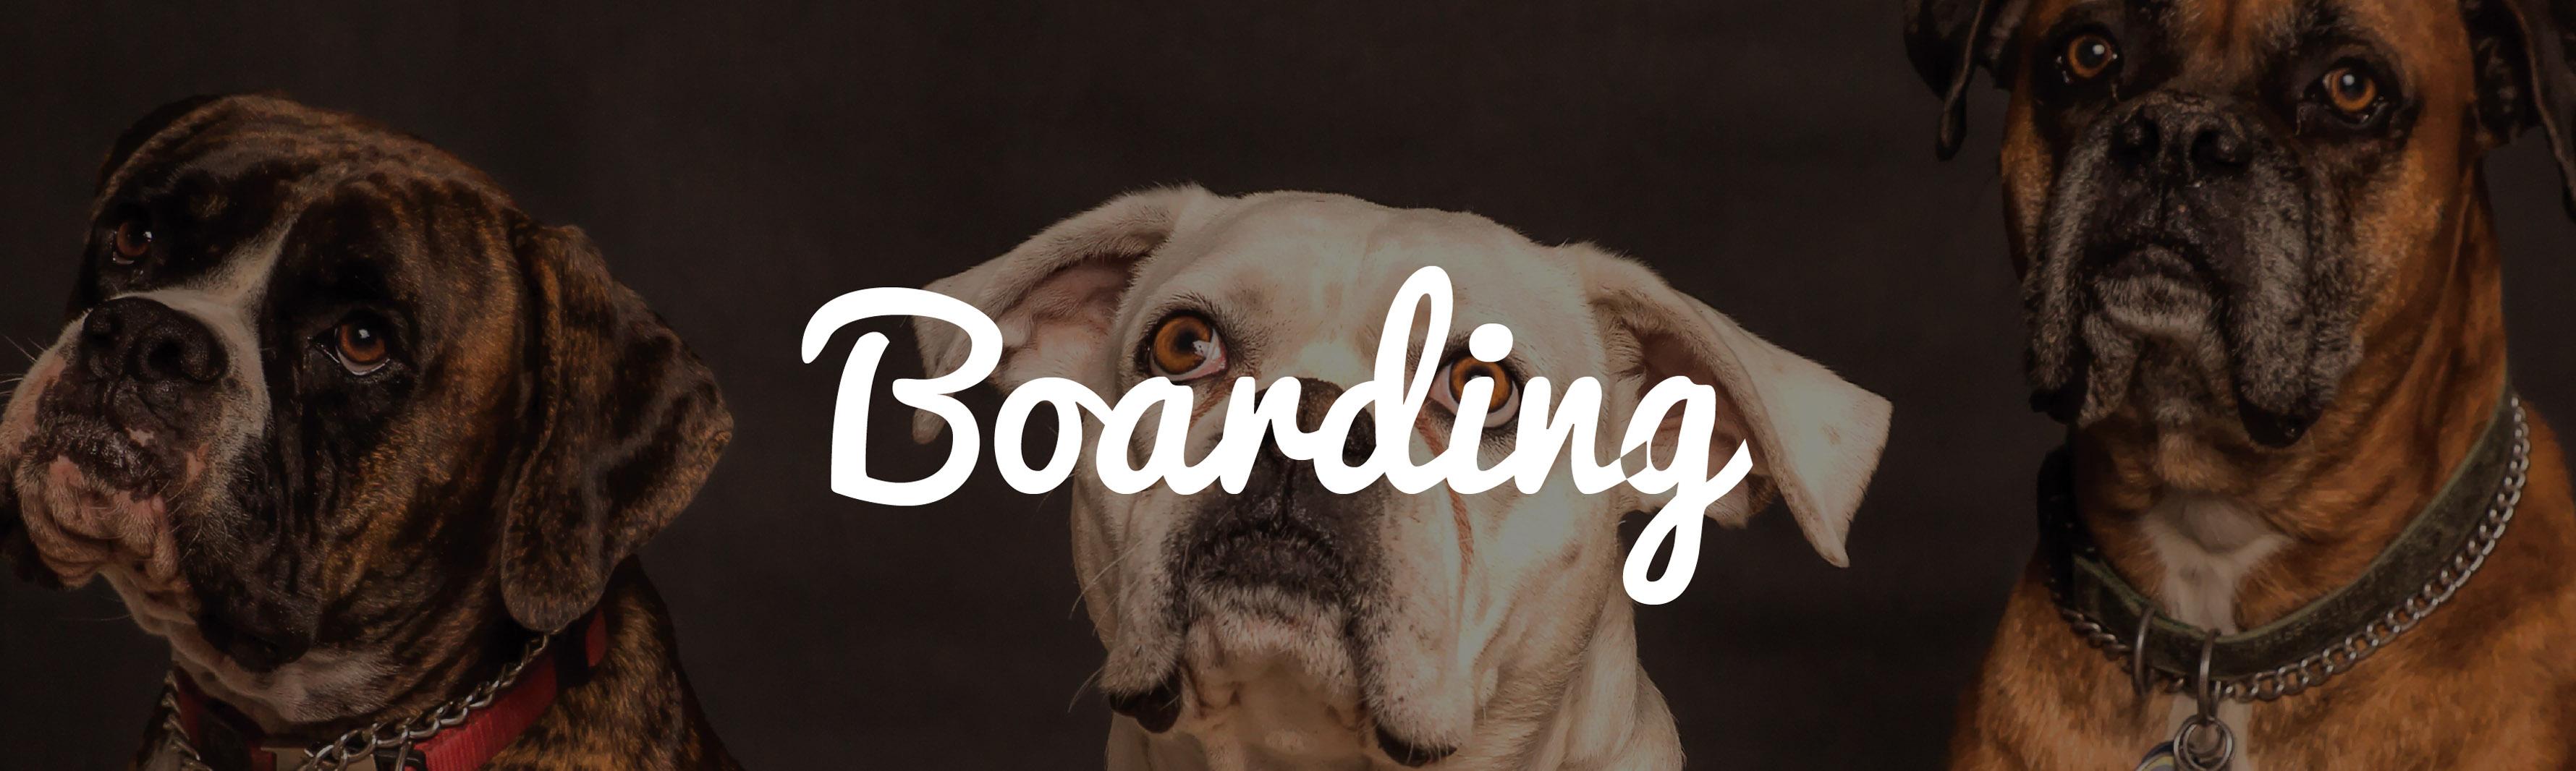 BoardingR